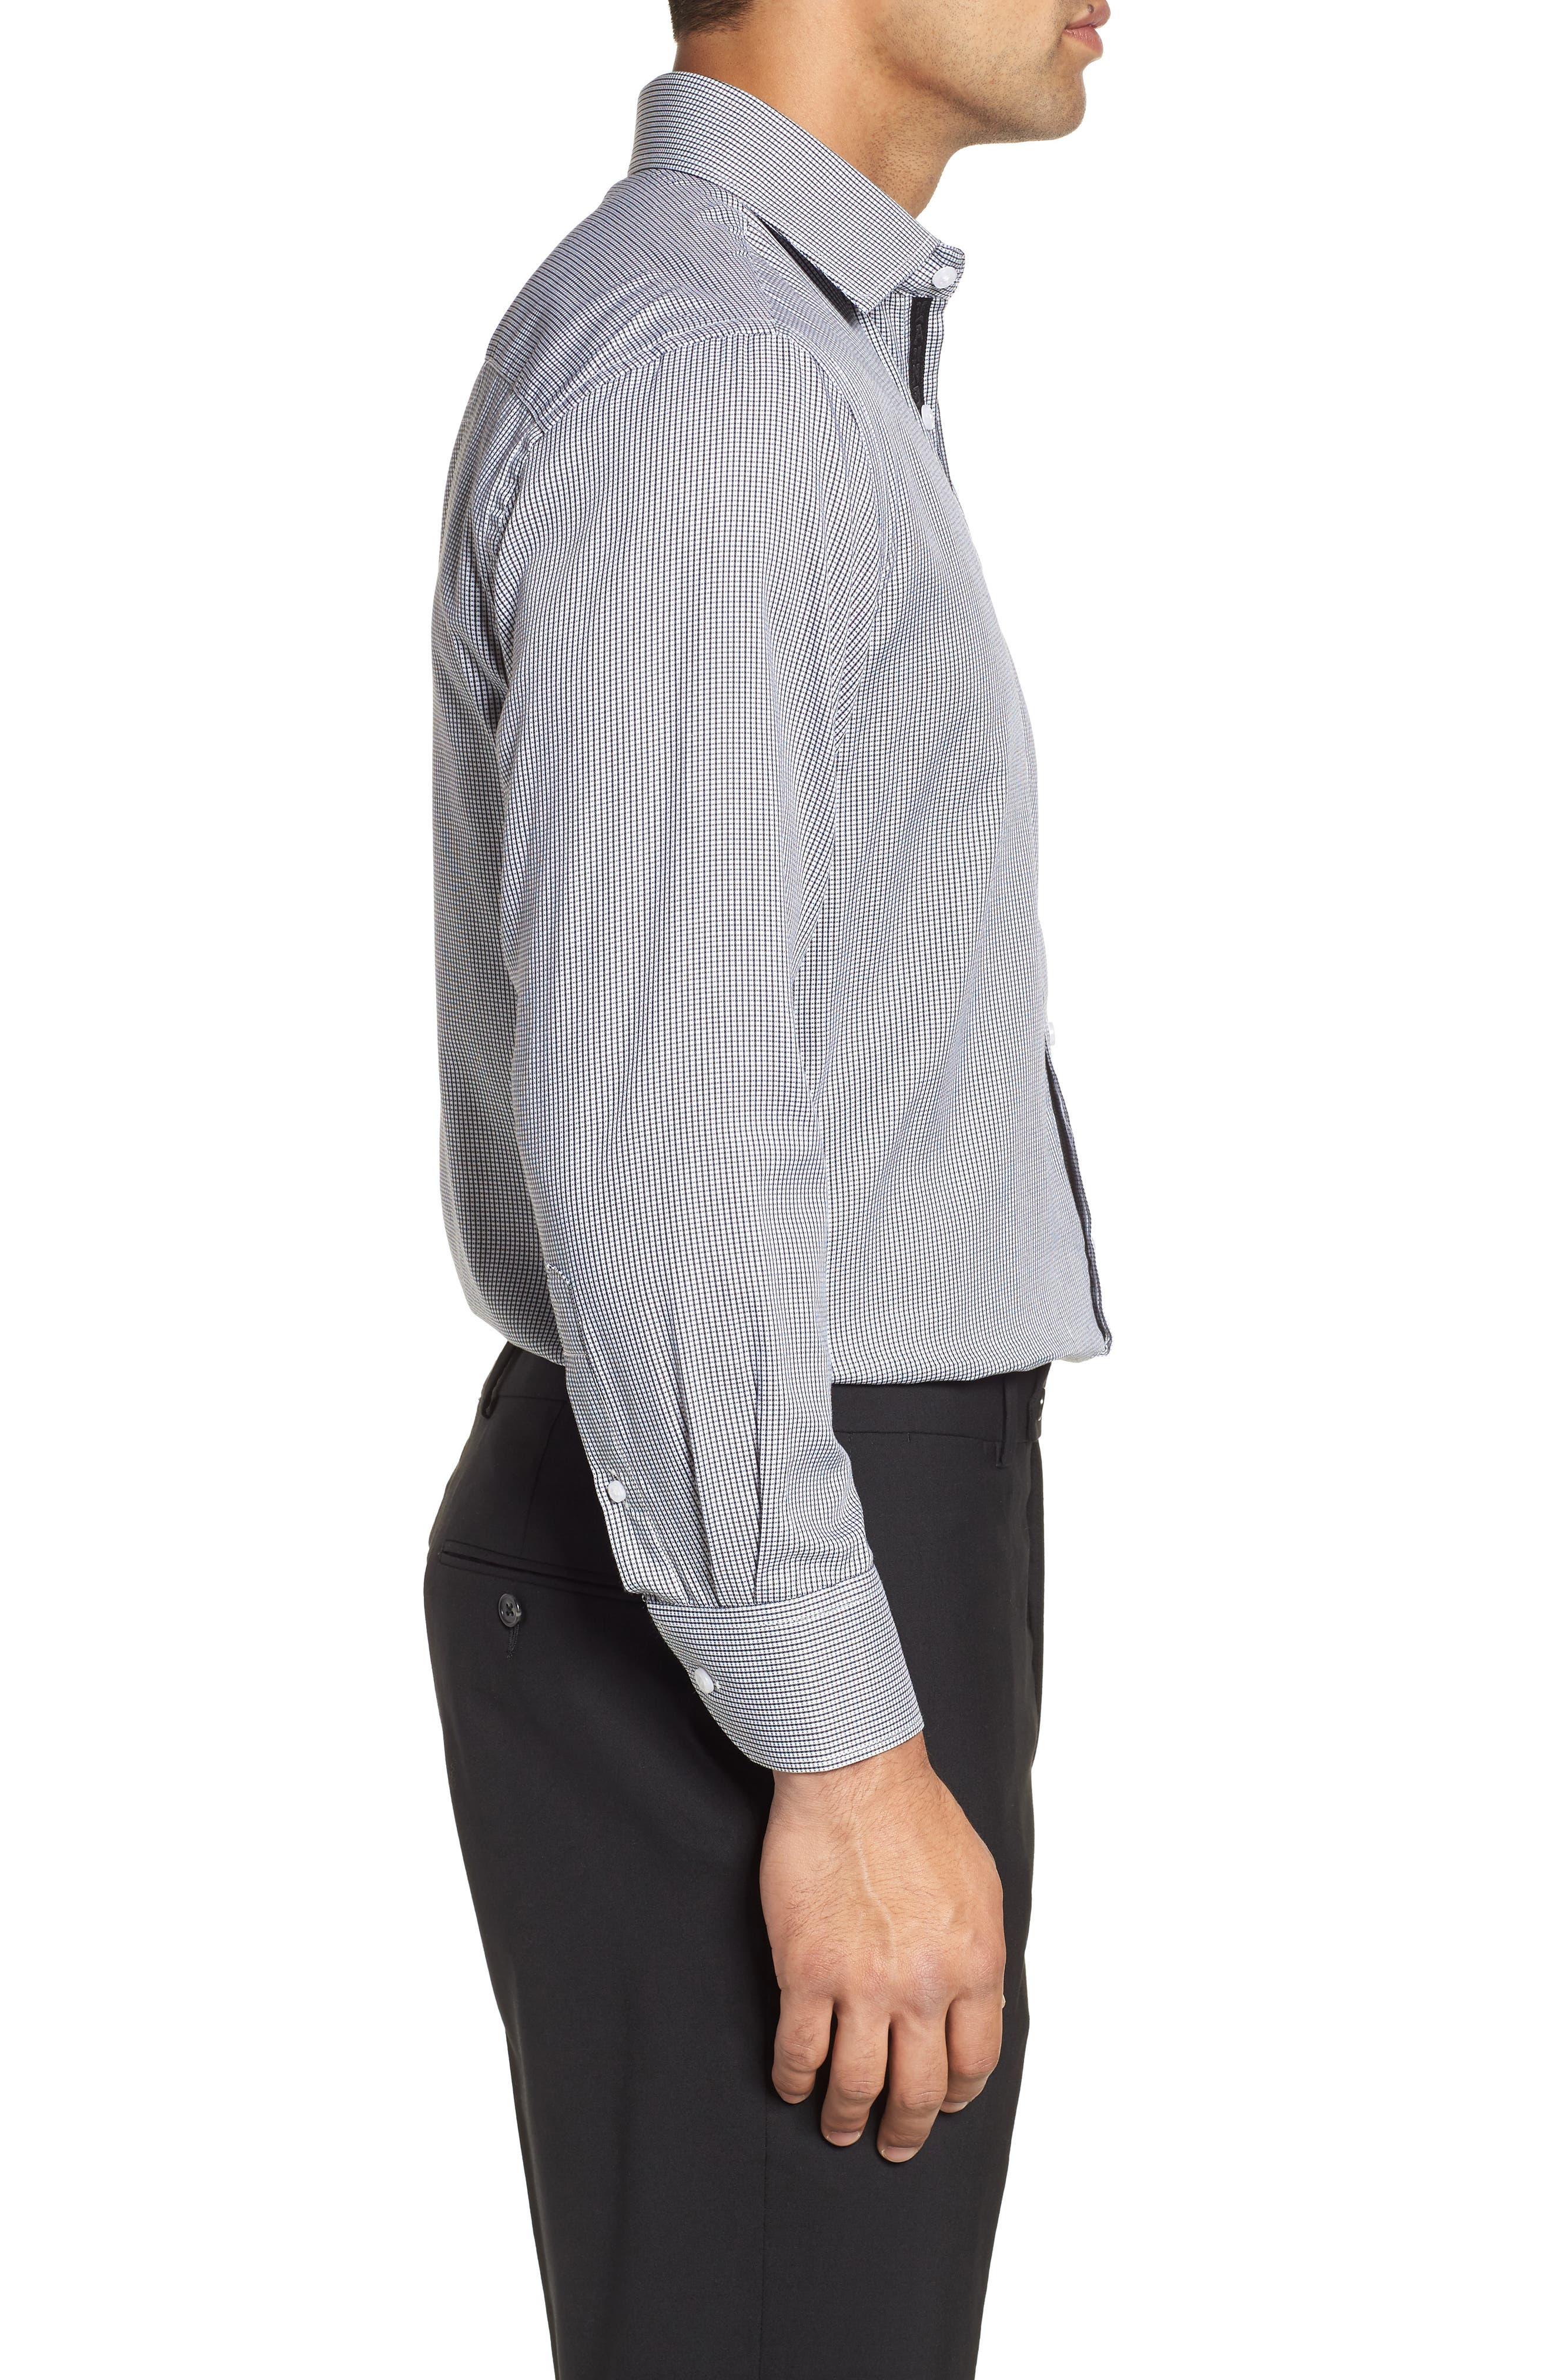 ENGLISH LAUNDRY,                             Regular Fit Check Dress Shirt,                             Alternate thumbnail 4, color,                             001